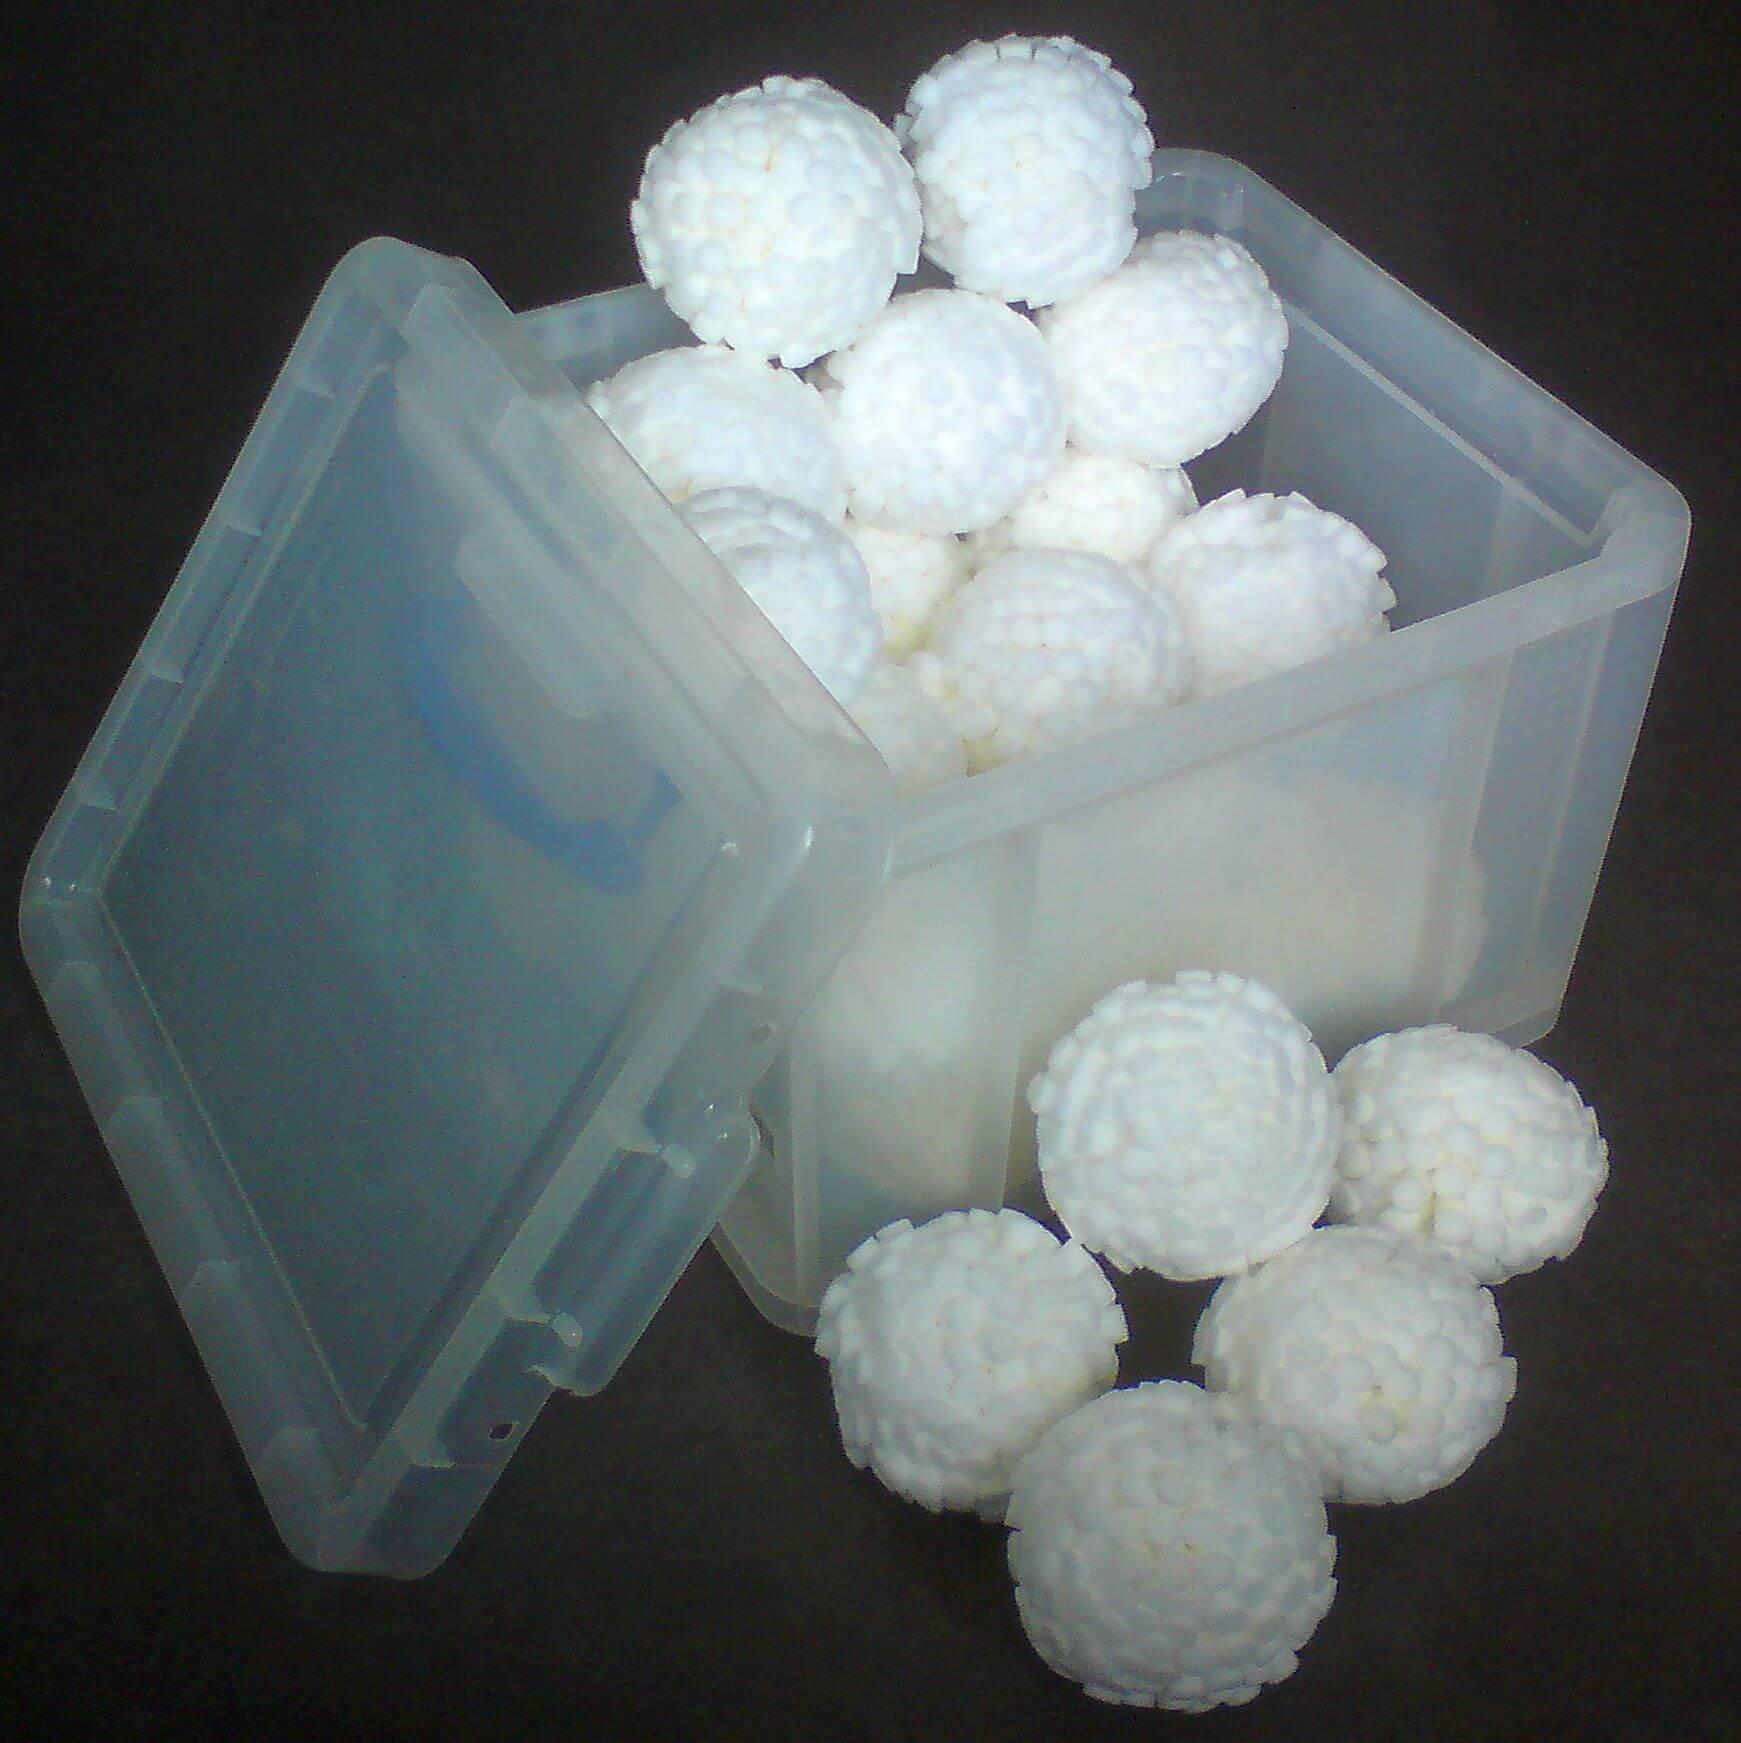 Opbergbox met 27 Droge Sneeuwballen